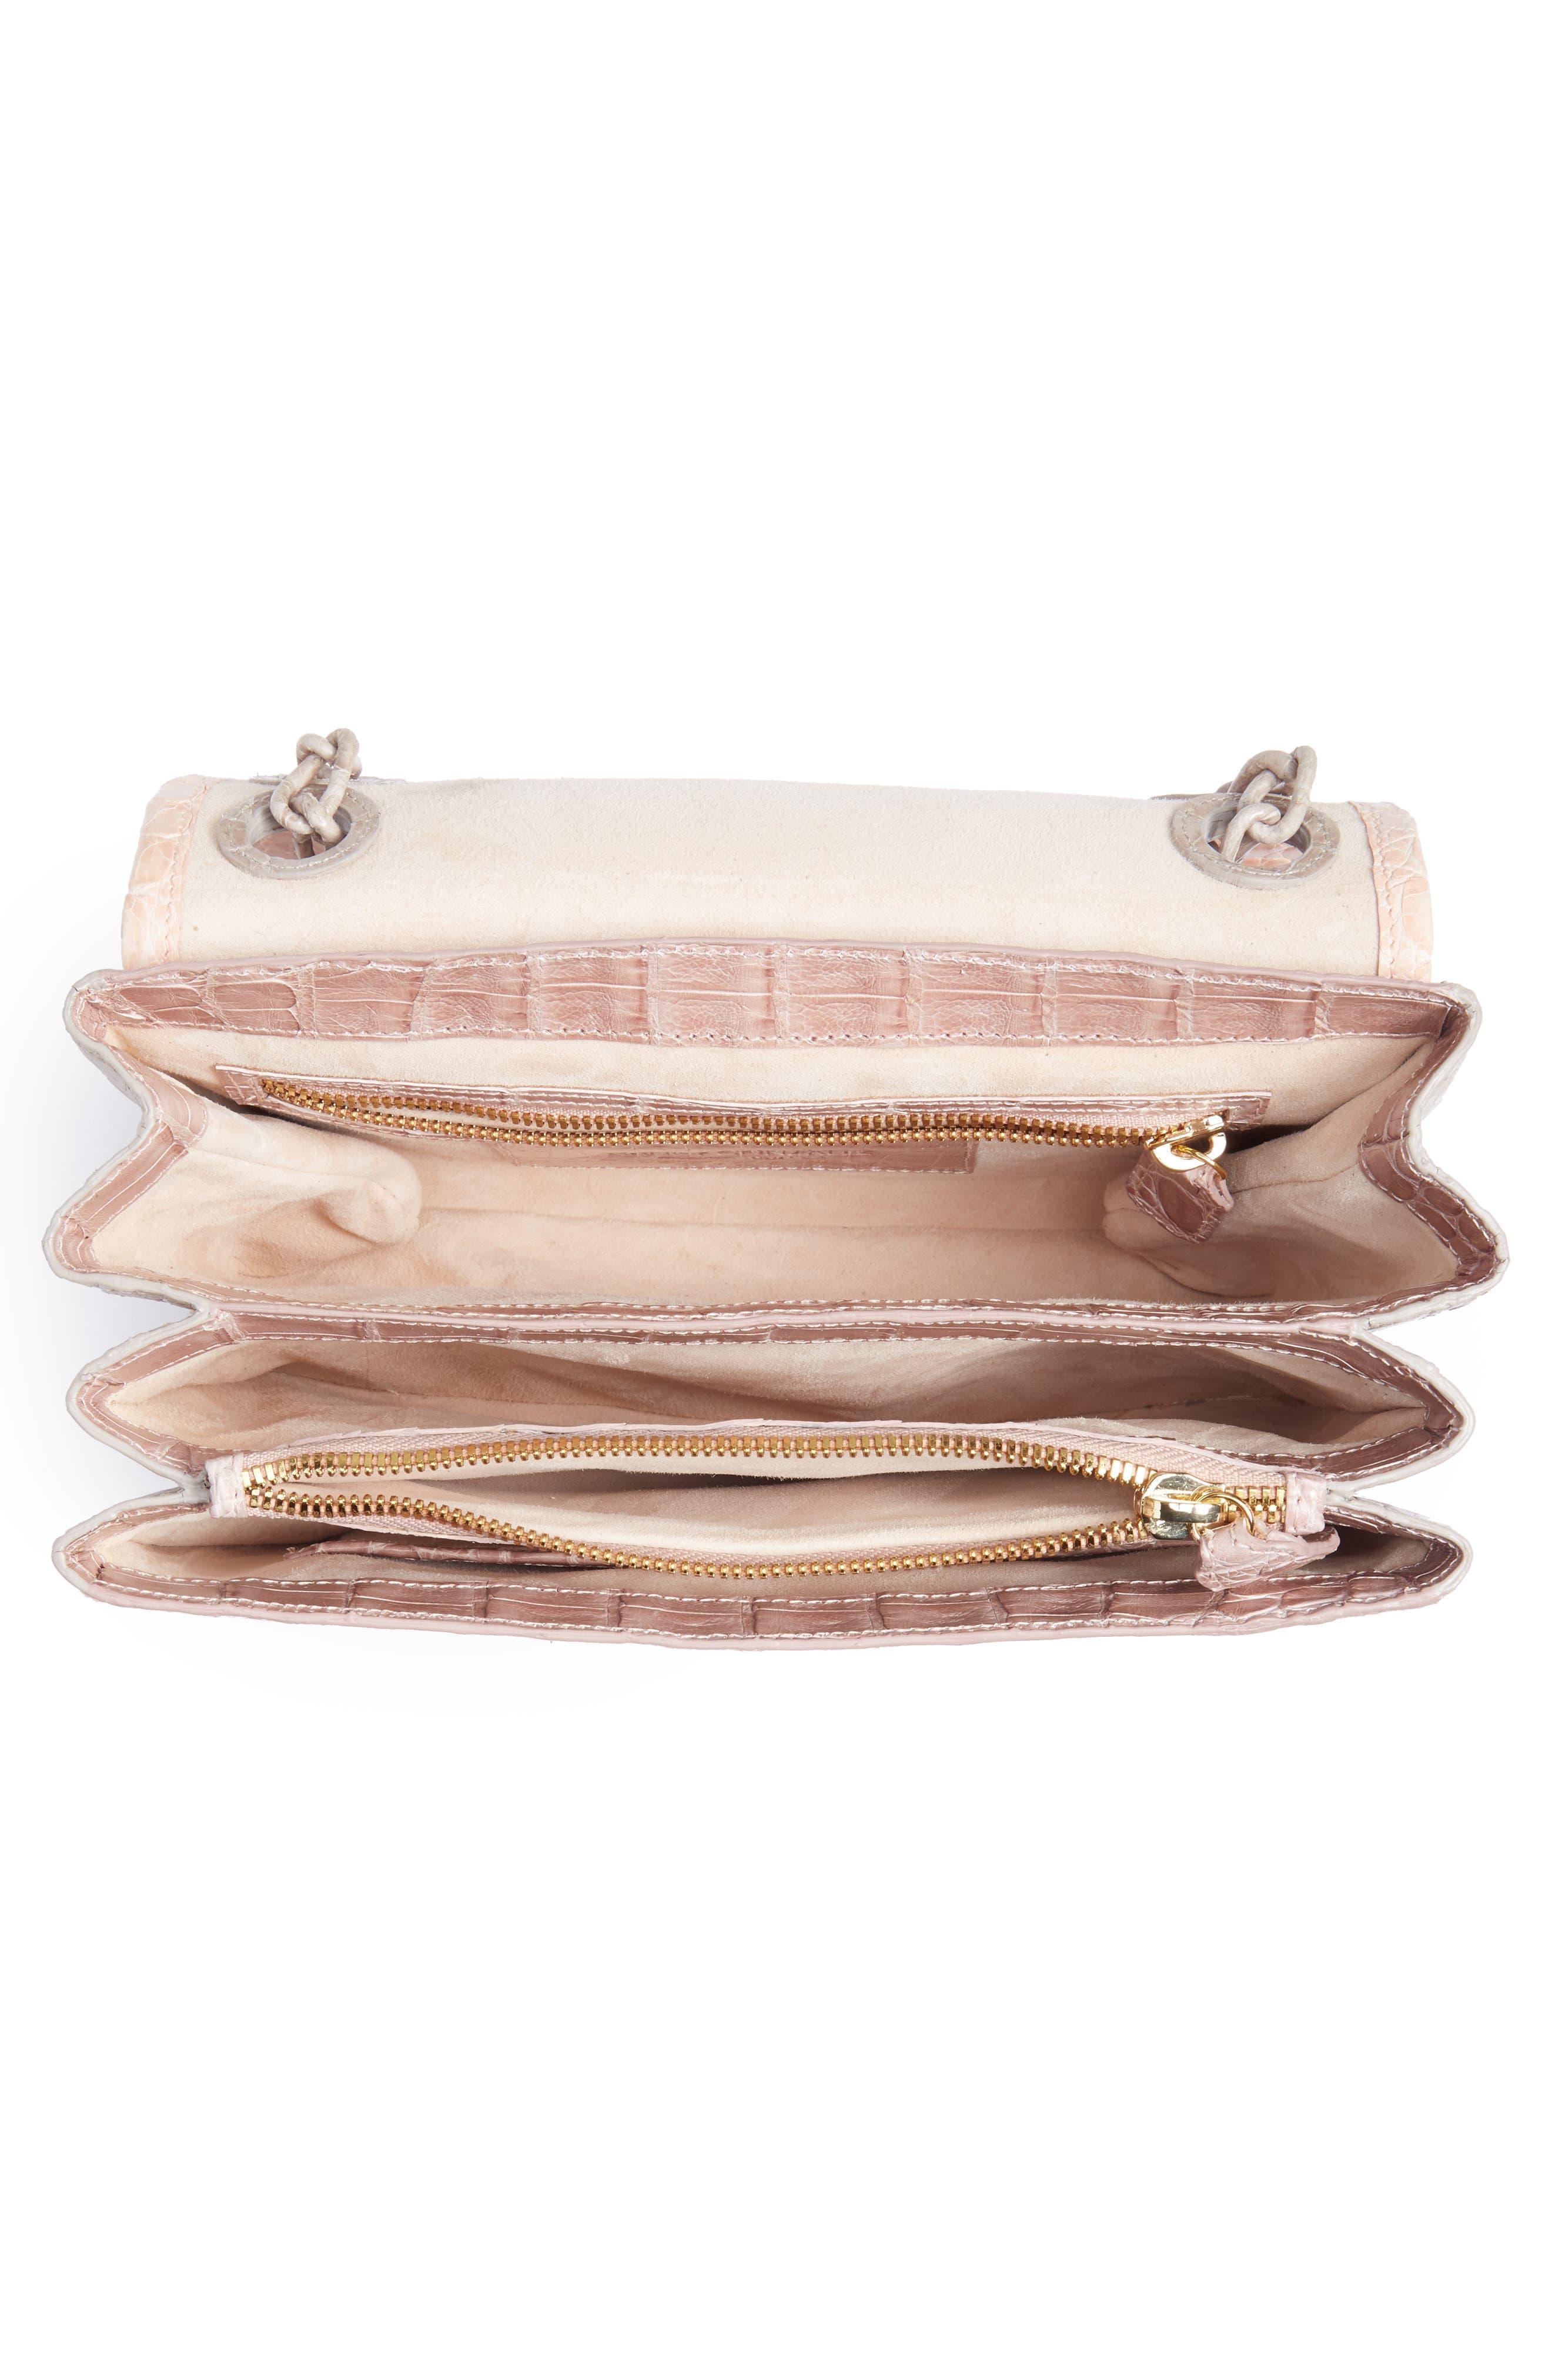 Small Madison Genuine Crocodile Shoulder Bag,                             Alternate thumbnail 5, color,                             NUDE/ TAUPE/ BLUSH